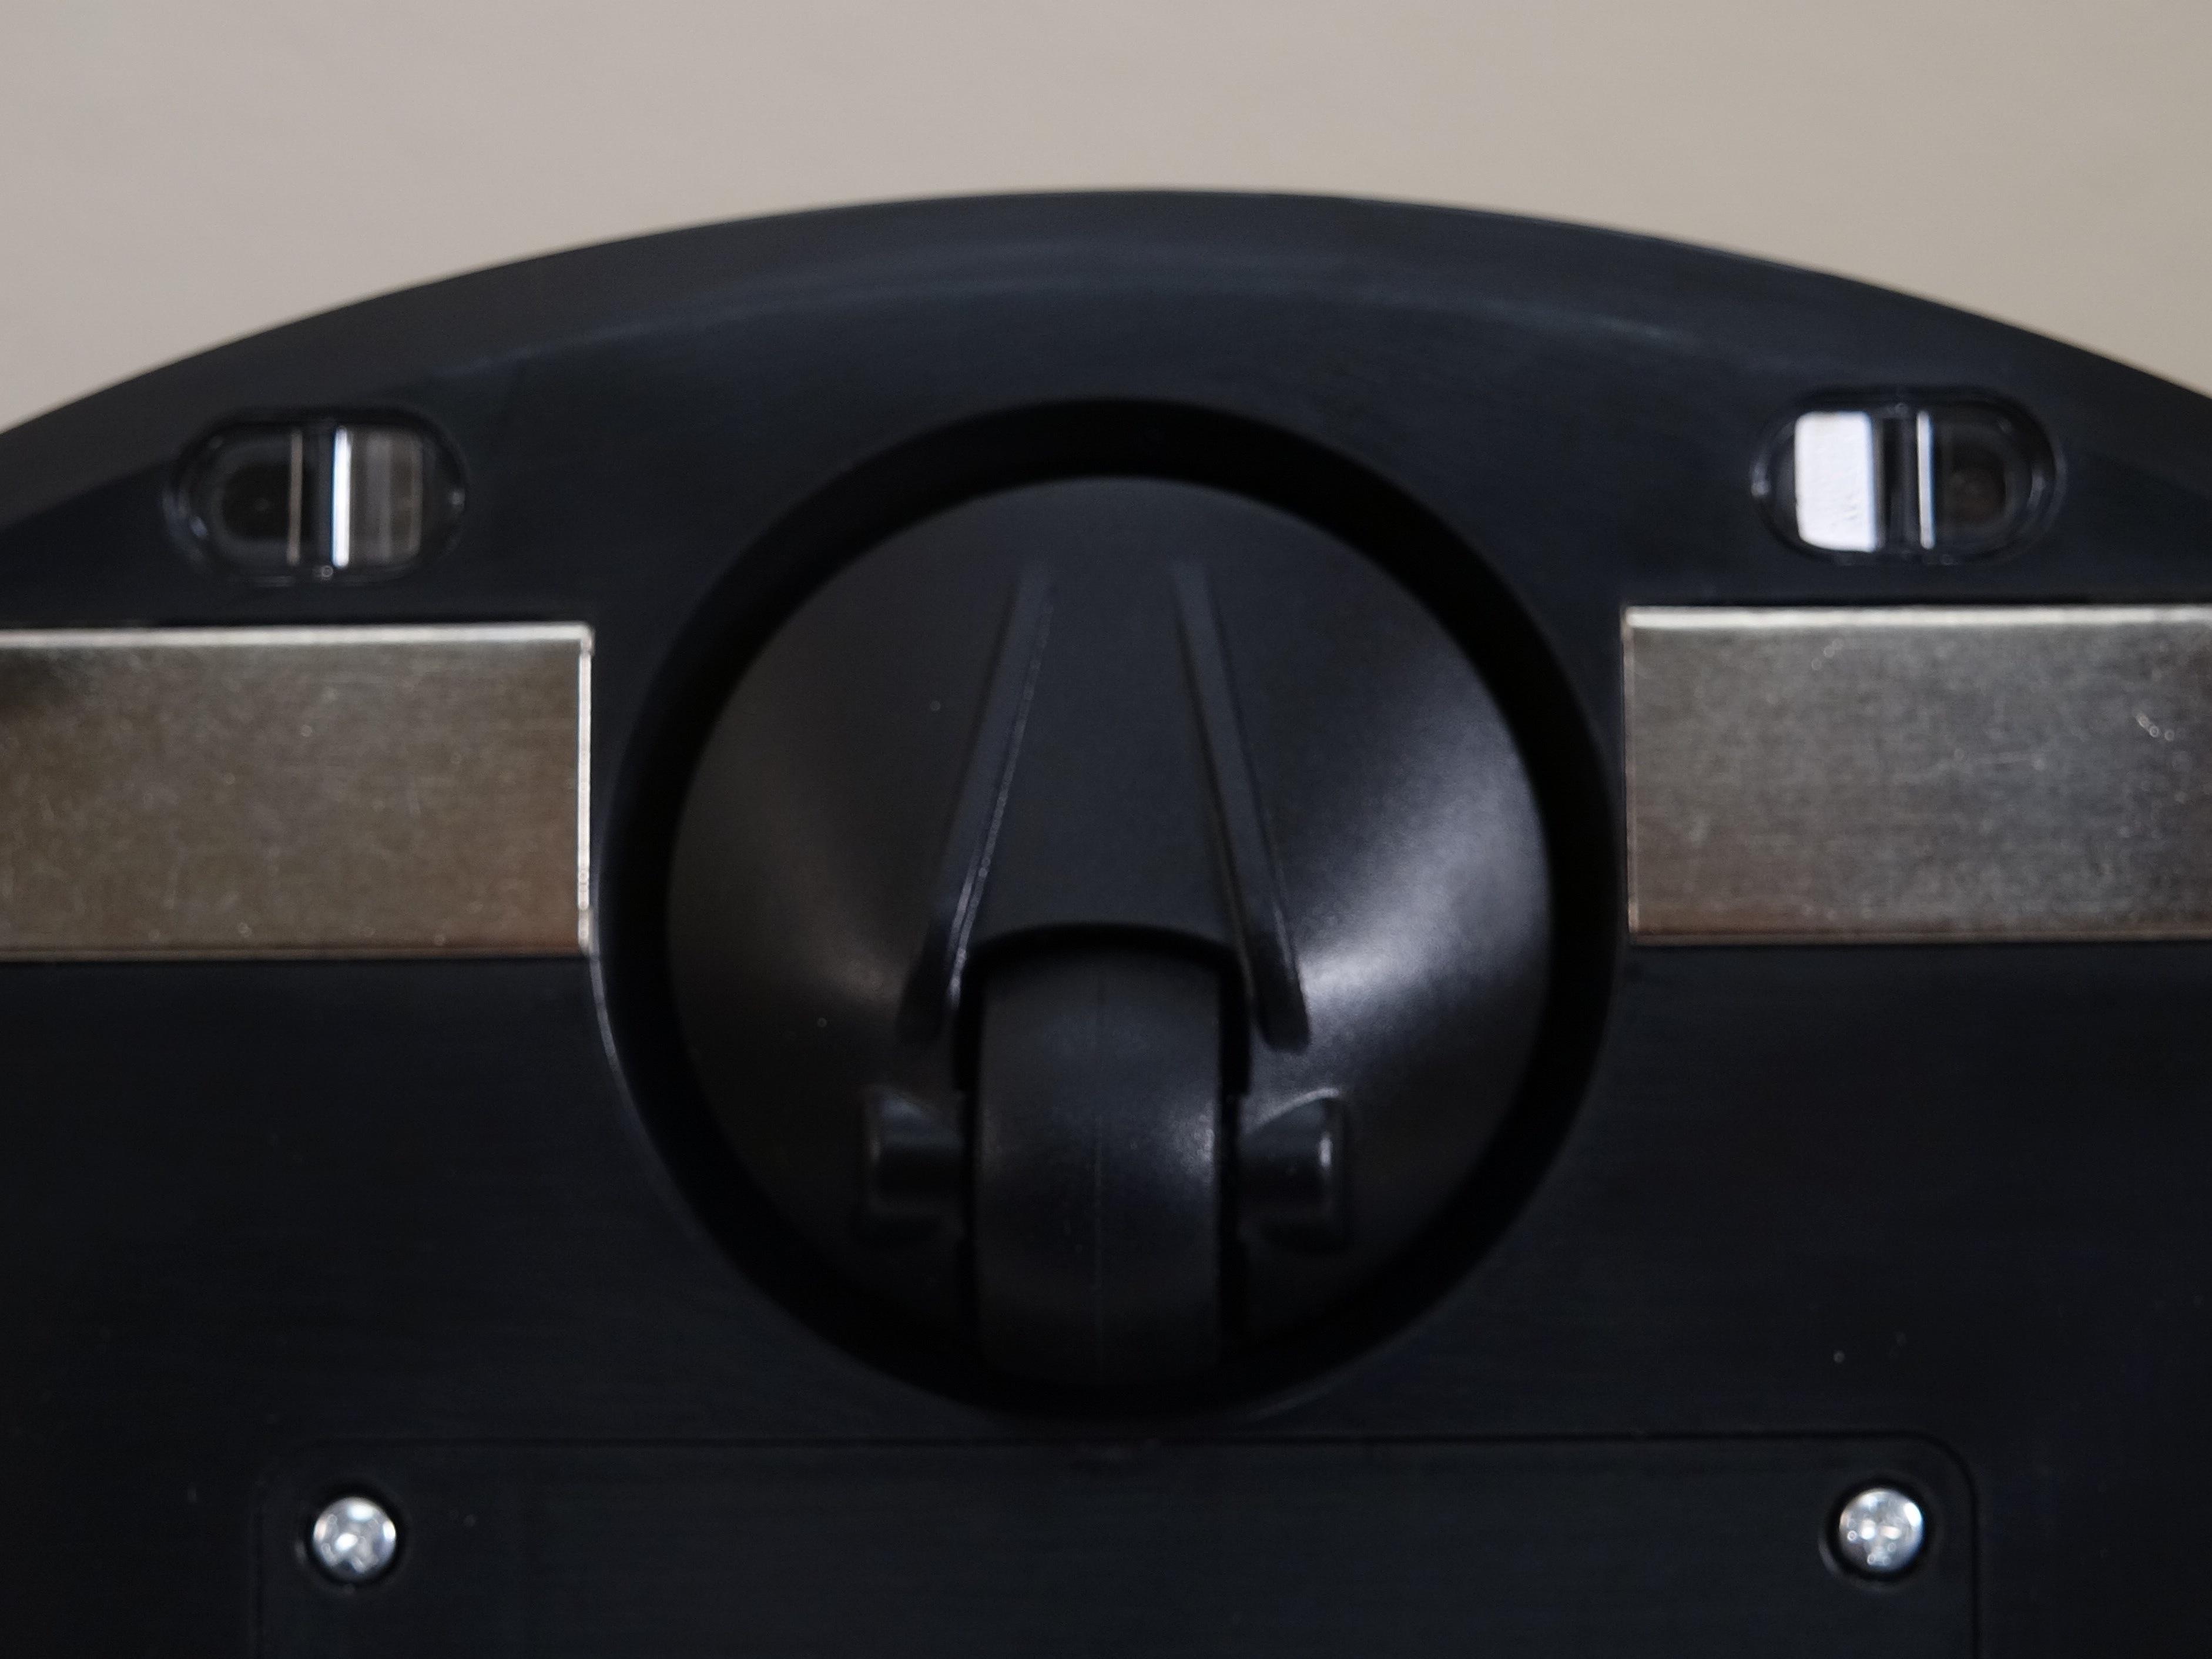 vacuum with floor ultrasonic p control uv cleaner smart blitzwolf patented robot wifi app bw